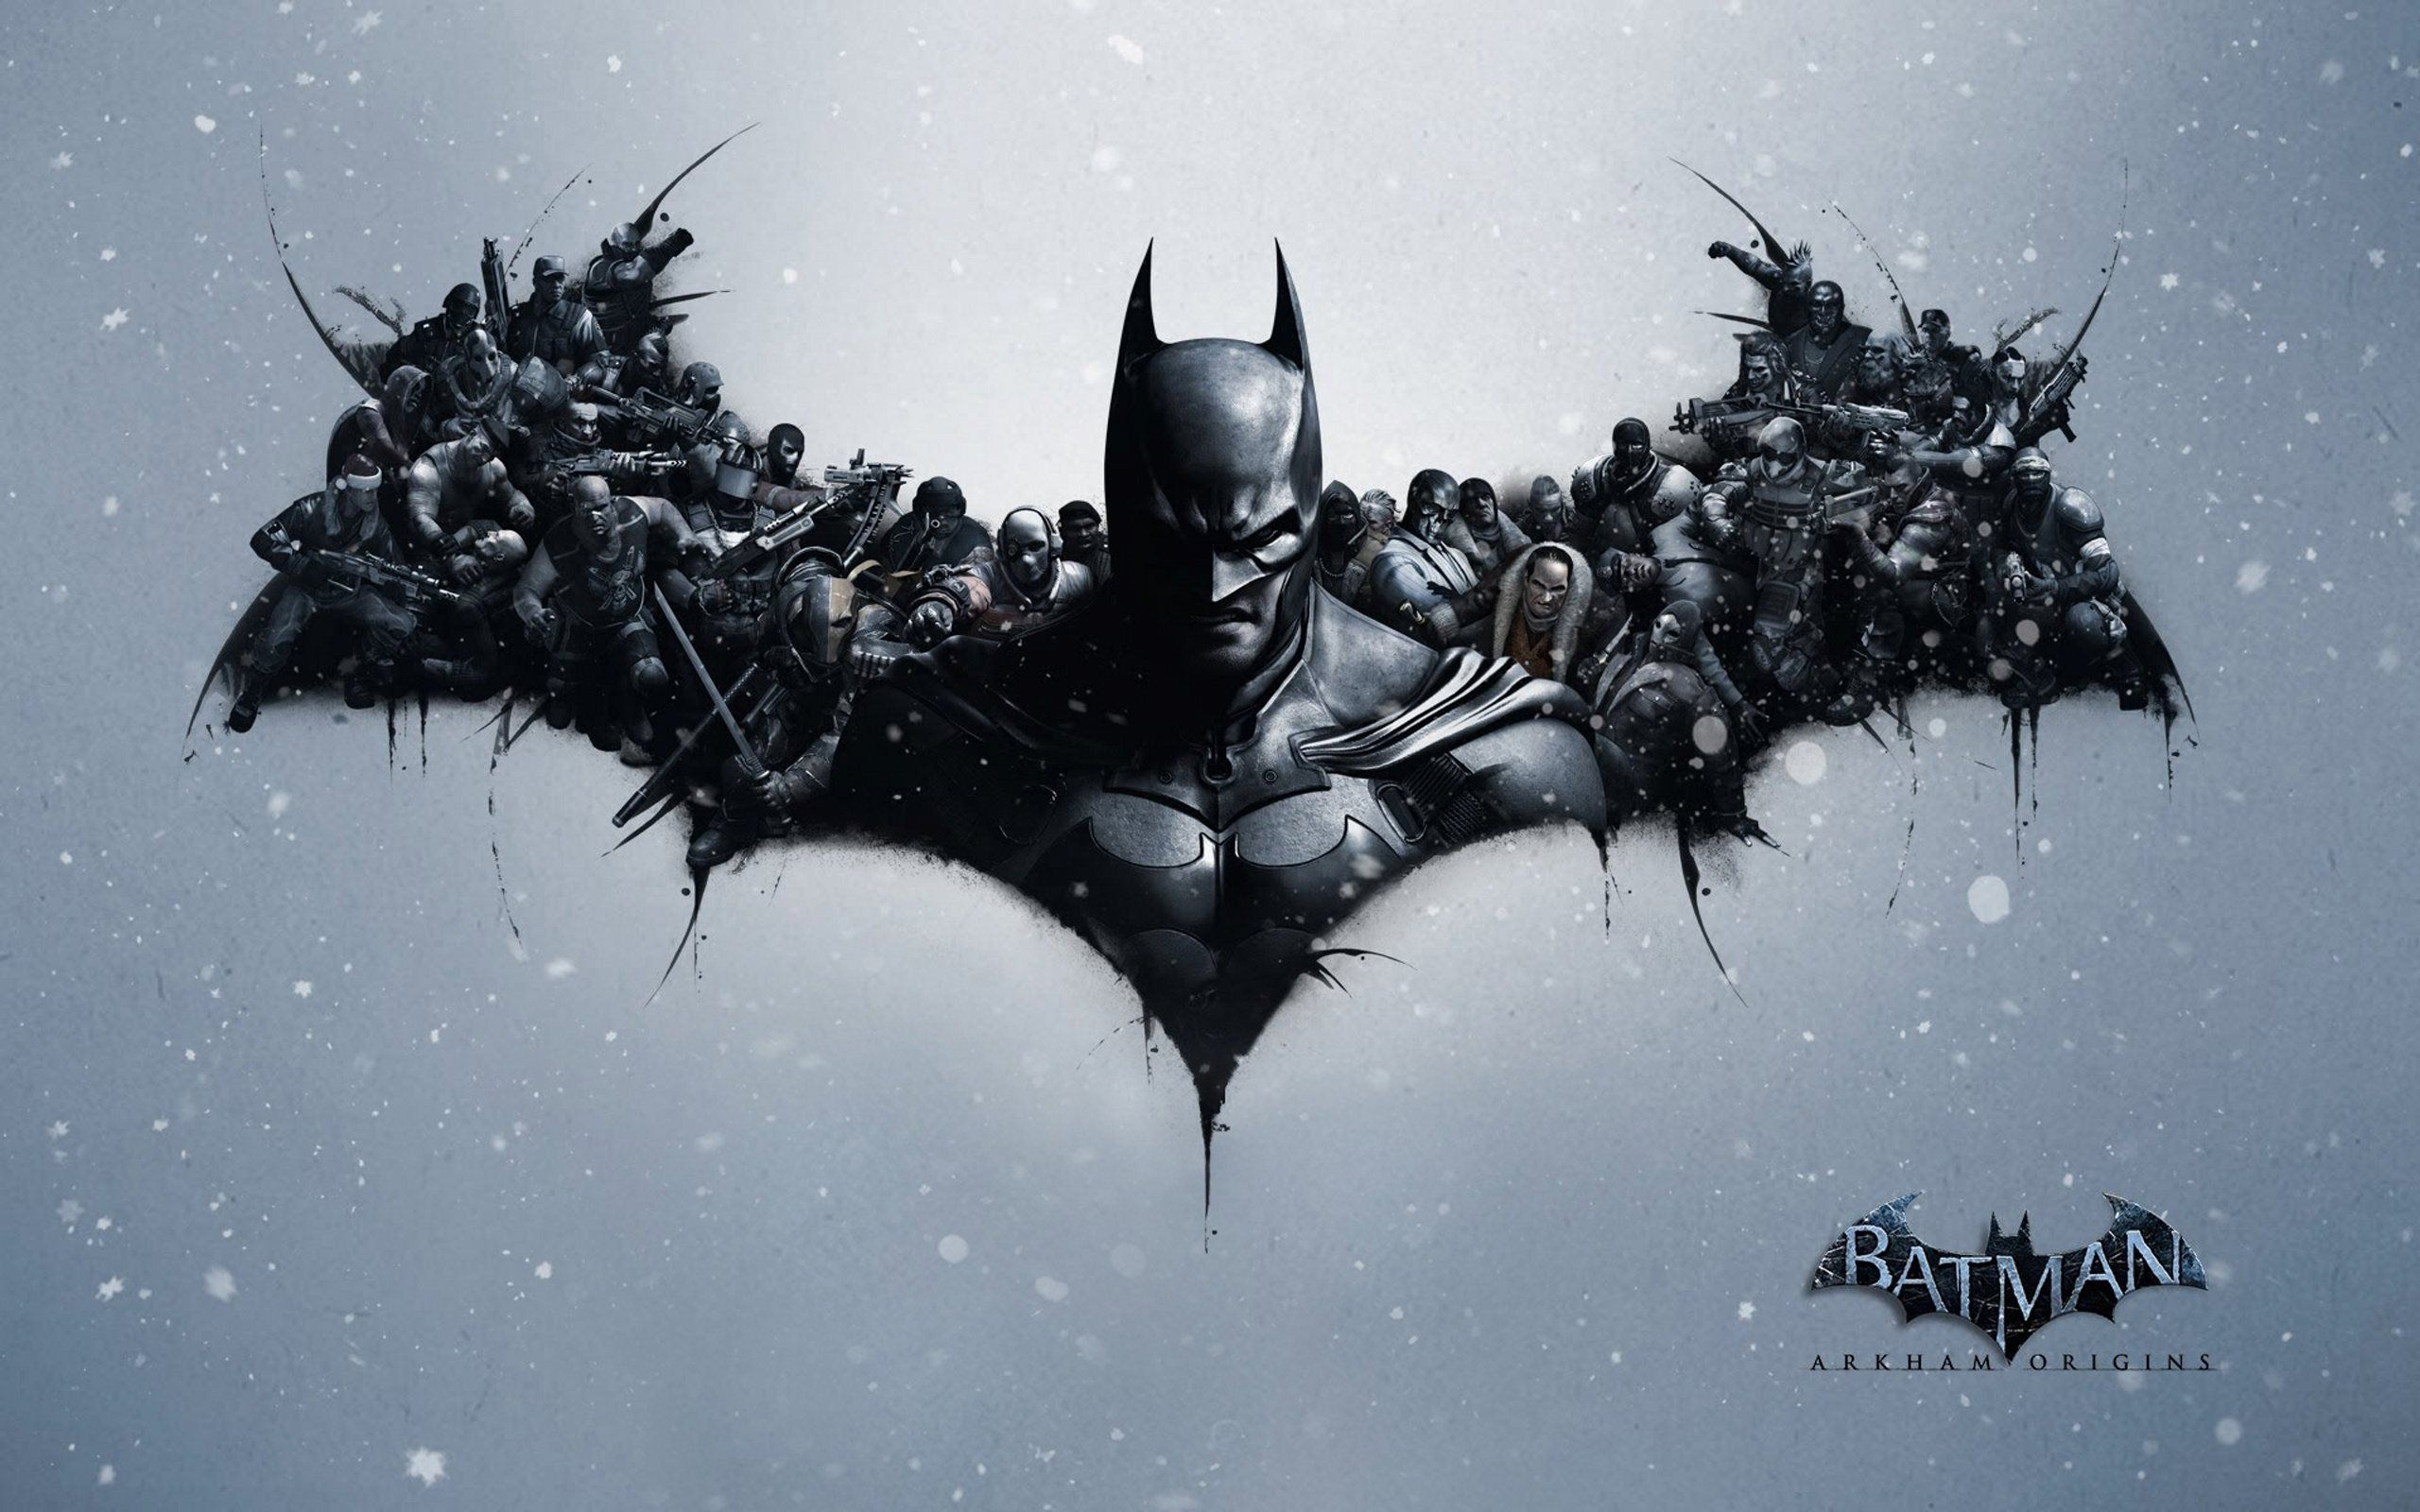 Best Hd Wallpaper Gookep Batman Image Picture Awesome Amazing Shoot Photography Batman Poster Batman Arkham Origins Batman Wallpaper